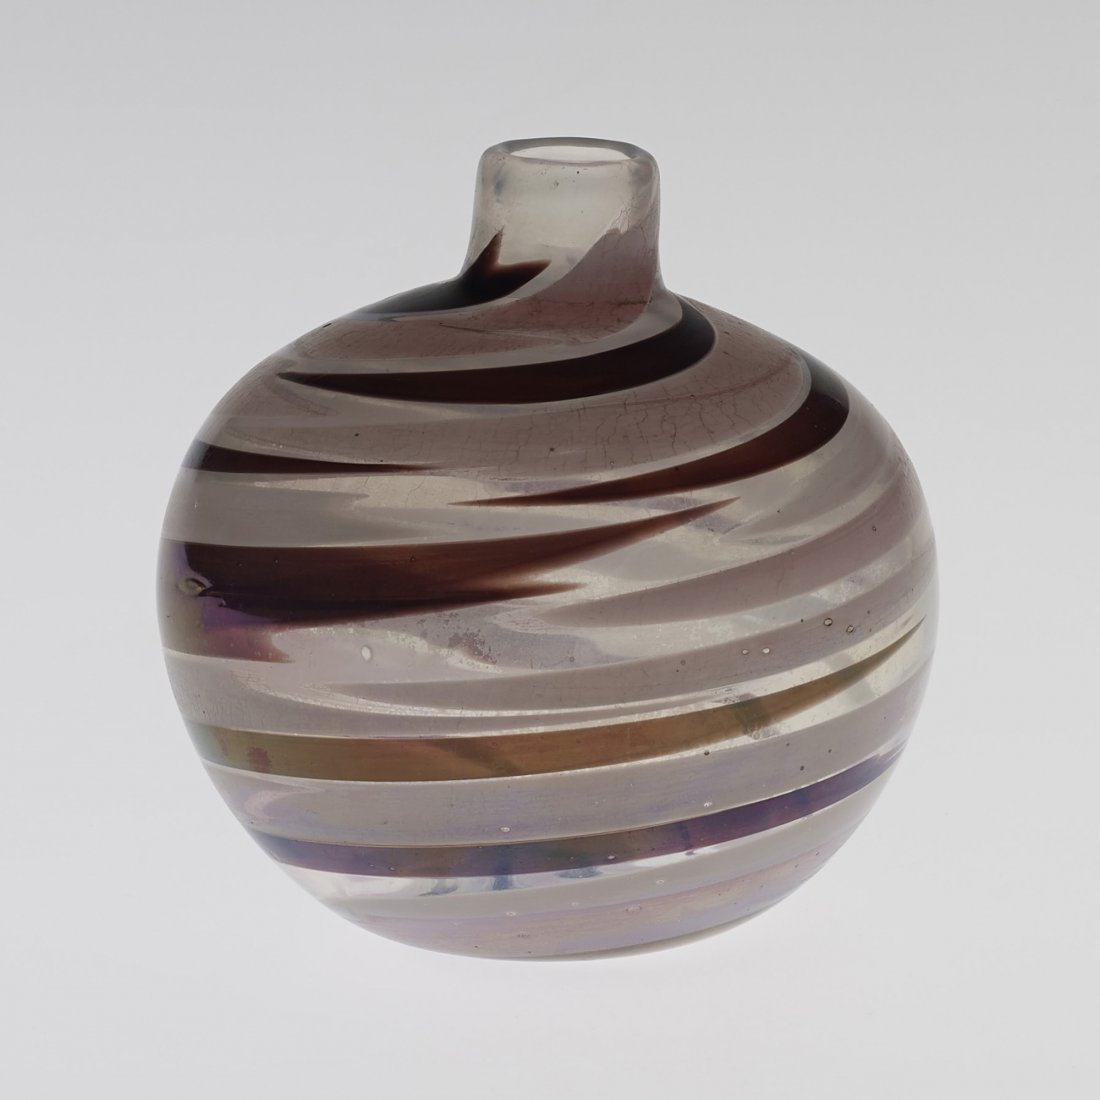 Carlo Scarpa Pennellate vase